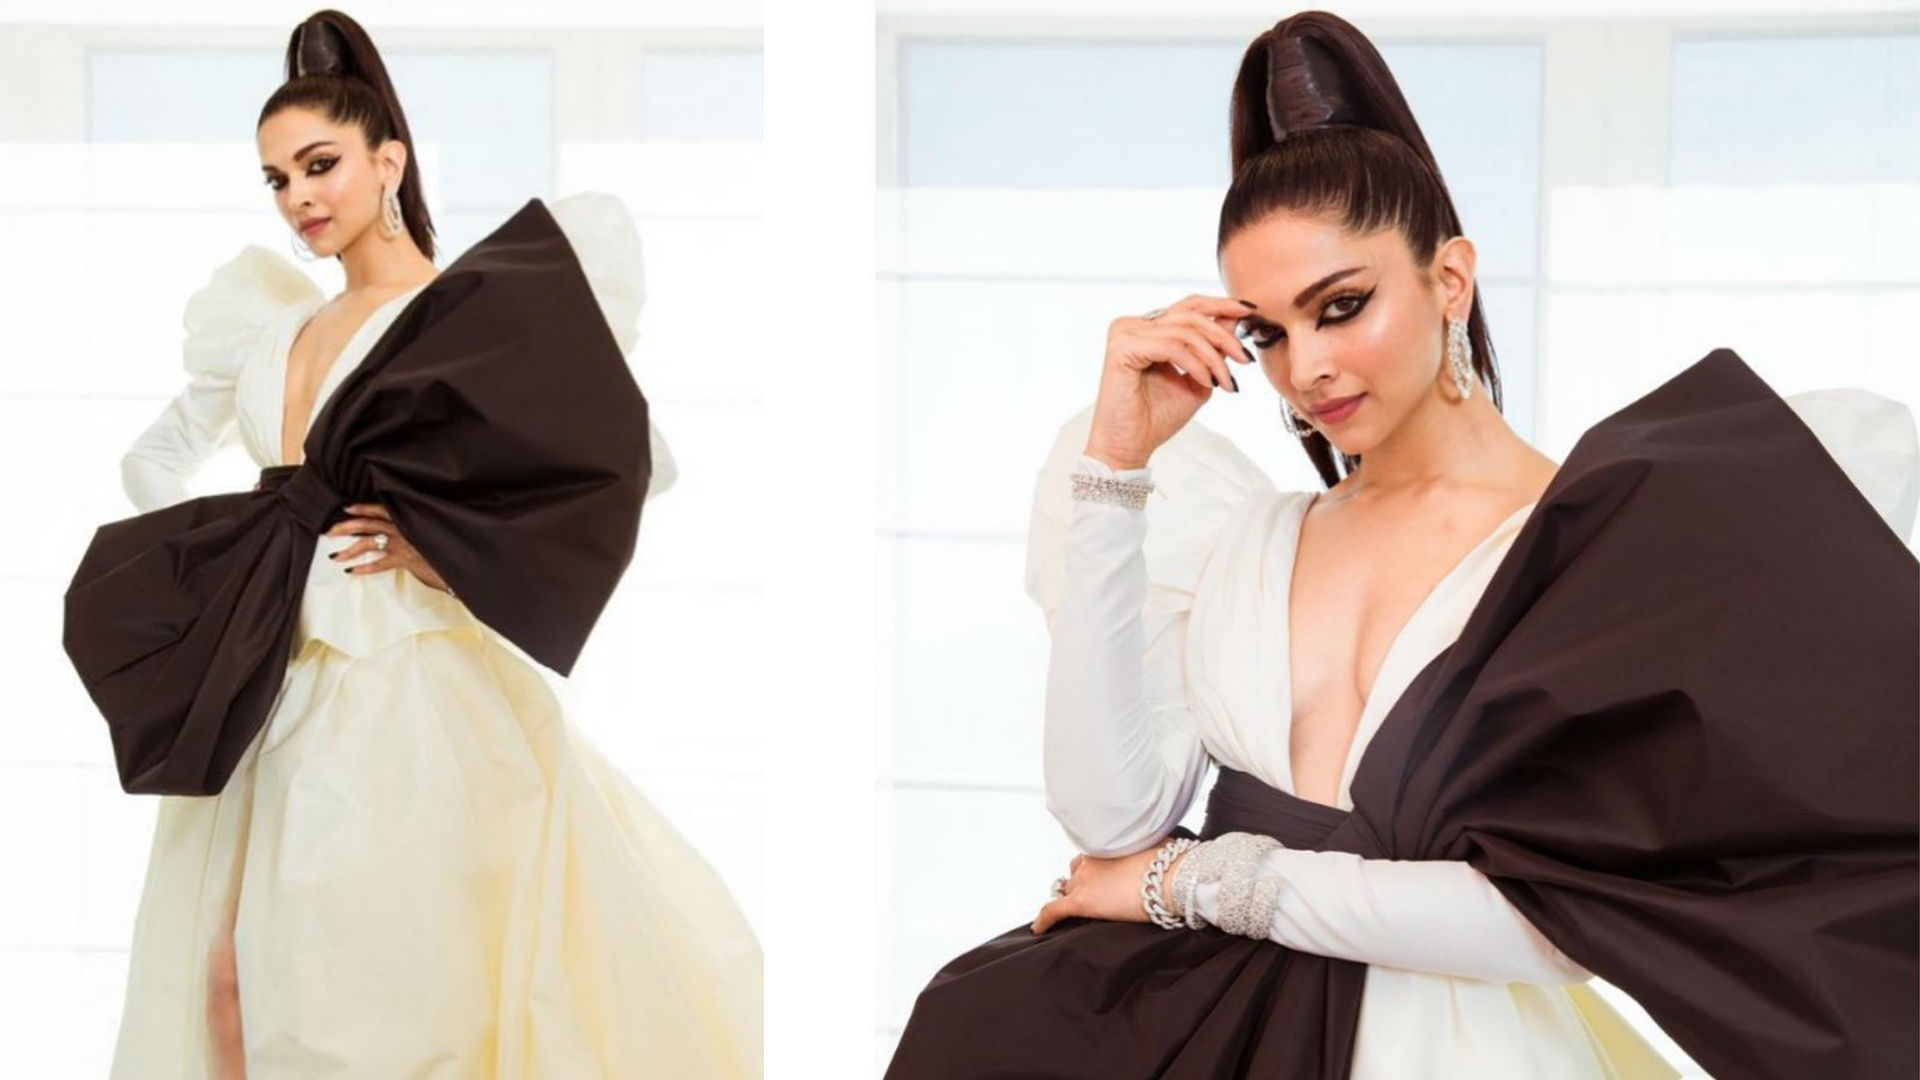 Deepika Padukone Cannes Film Festival 2019 Look Actress ...